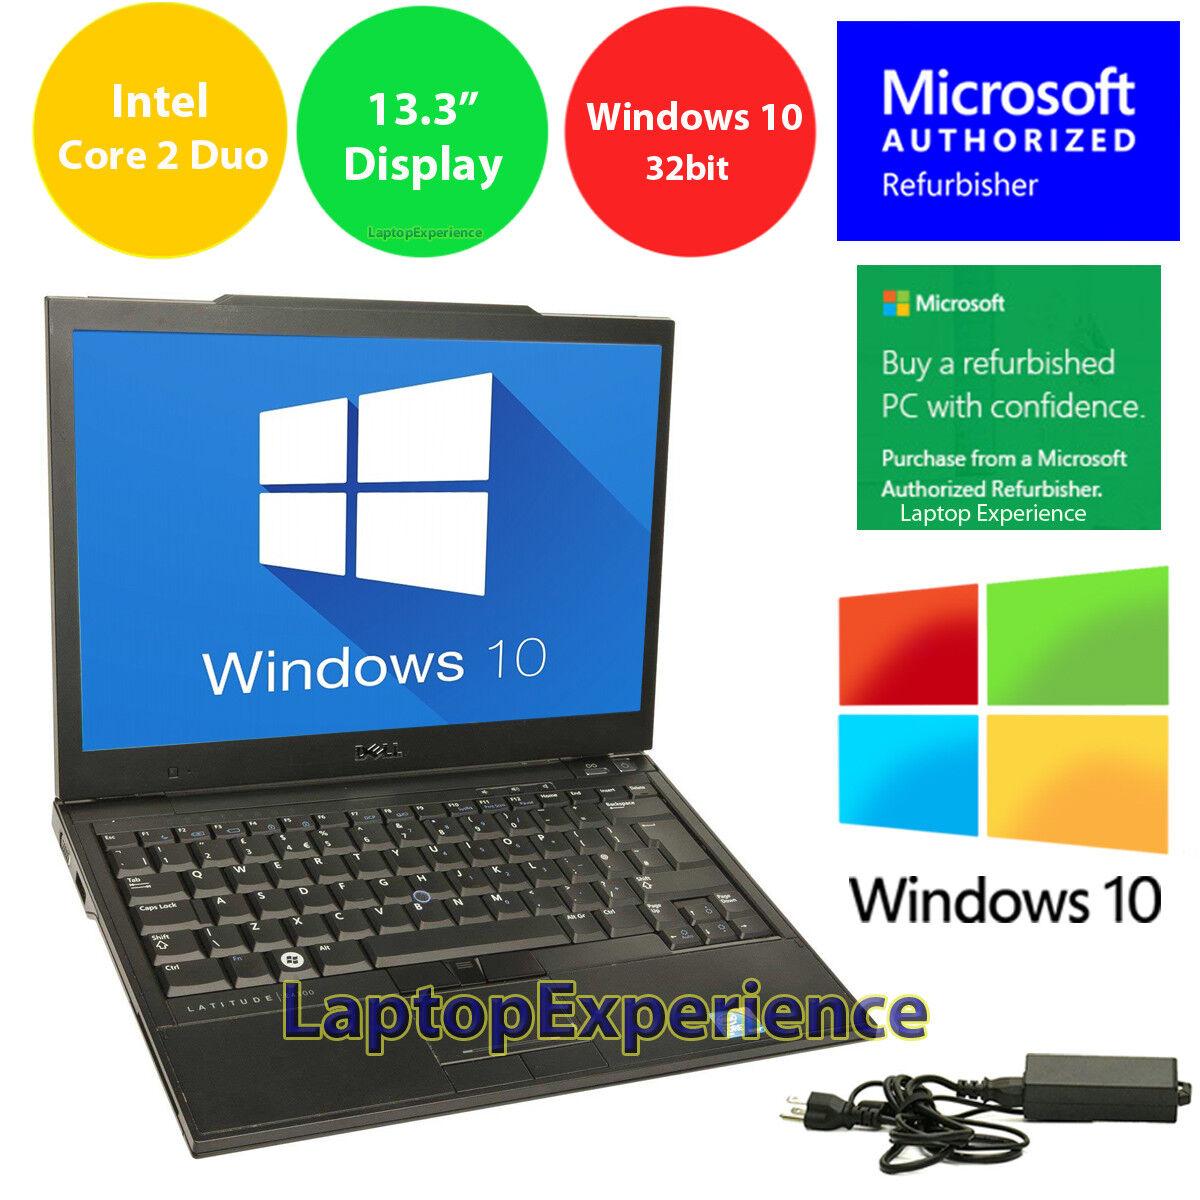 "Laptop Windows - DELL LAPTOP LATITUDE CORE WINDOWS 10 32bit WIN DVD WiFi NOTEBOOK PC 13.3"" HD 3GB"